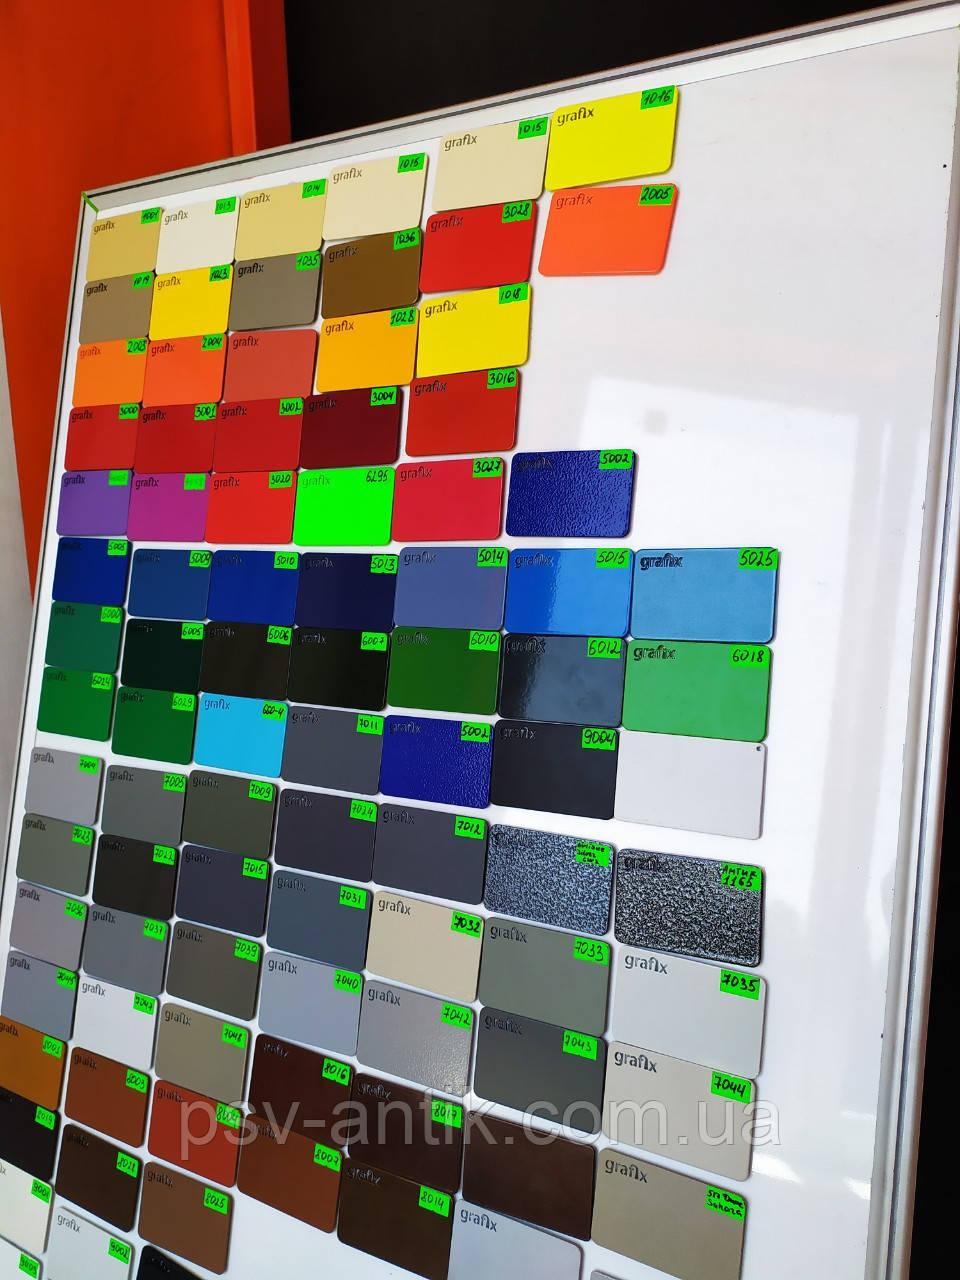 Порошковая краска глянцевая, полиэфирная, архитектурная, 8002